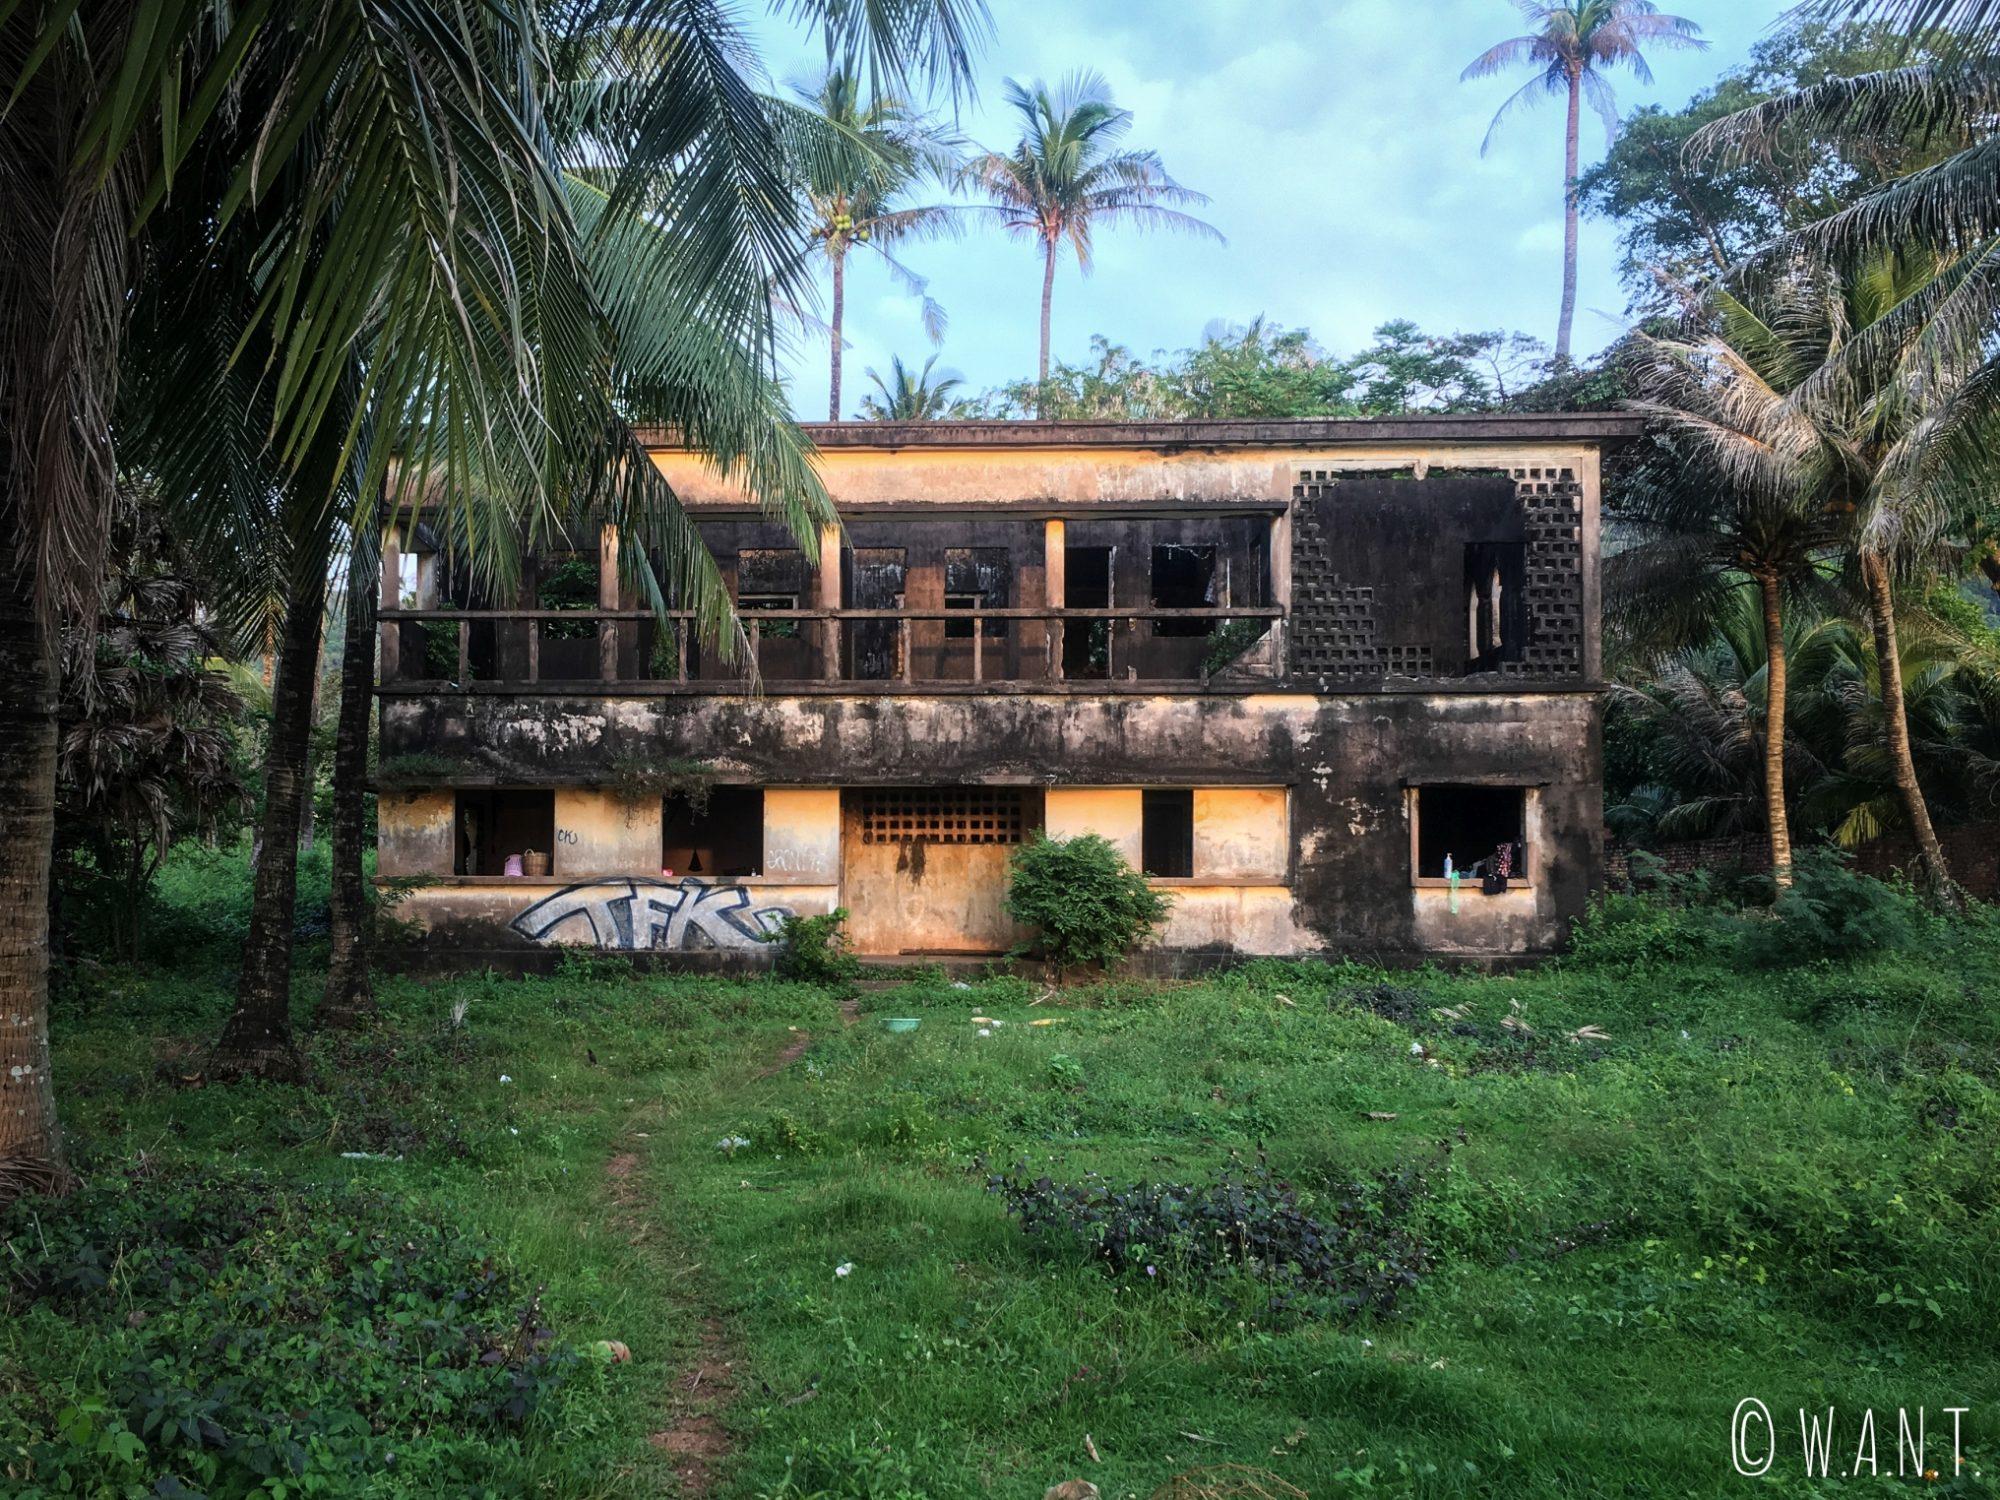 Villa abandonnée dans les rues de Kep